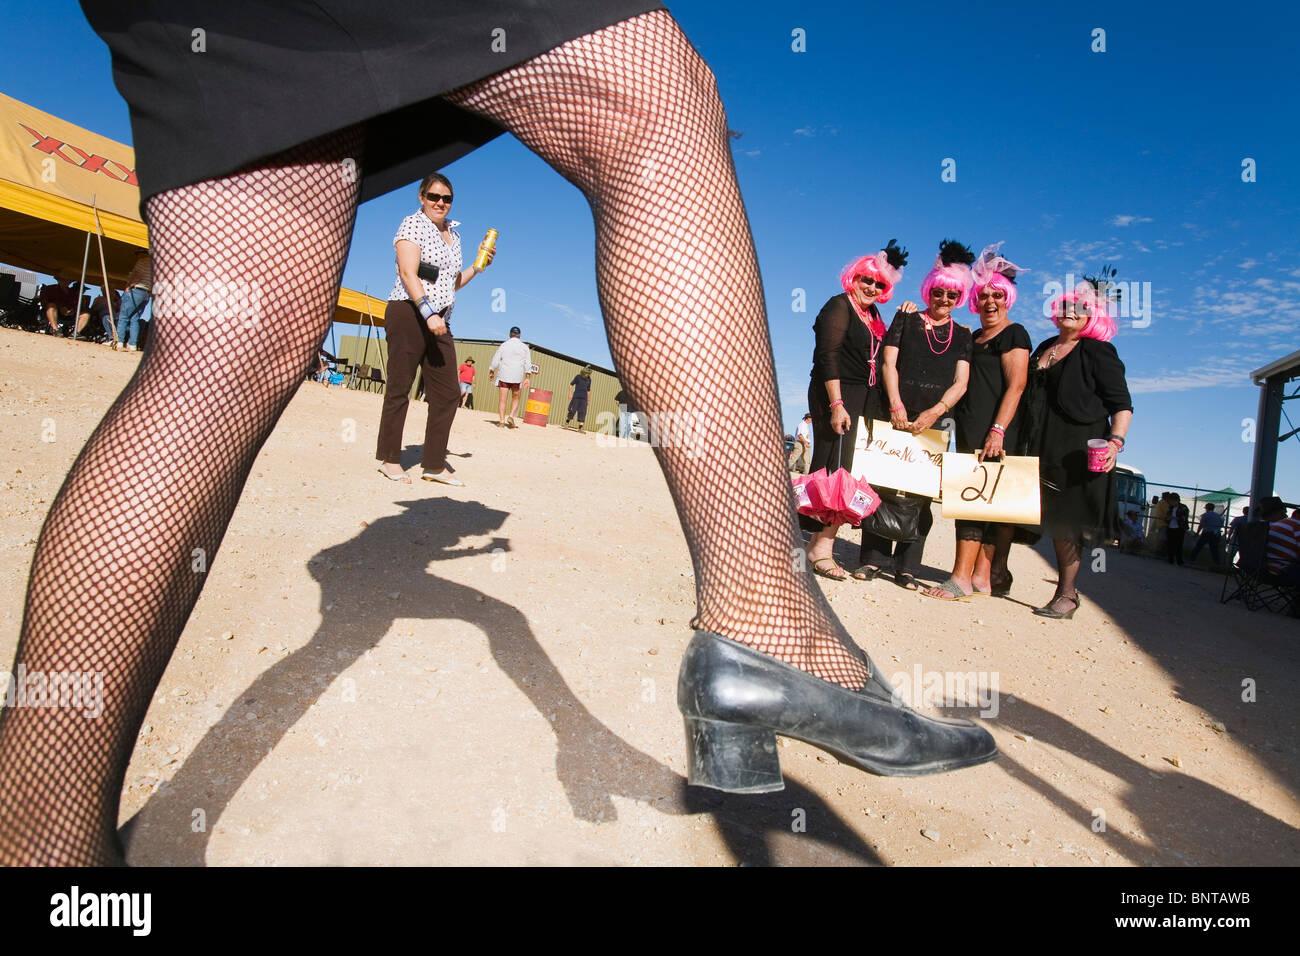 Race goers in costume dress for the fun of the Birdsville Races.  Birdsville, Queensland, AUSTRALIA. - Stock Image